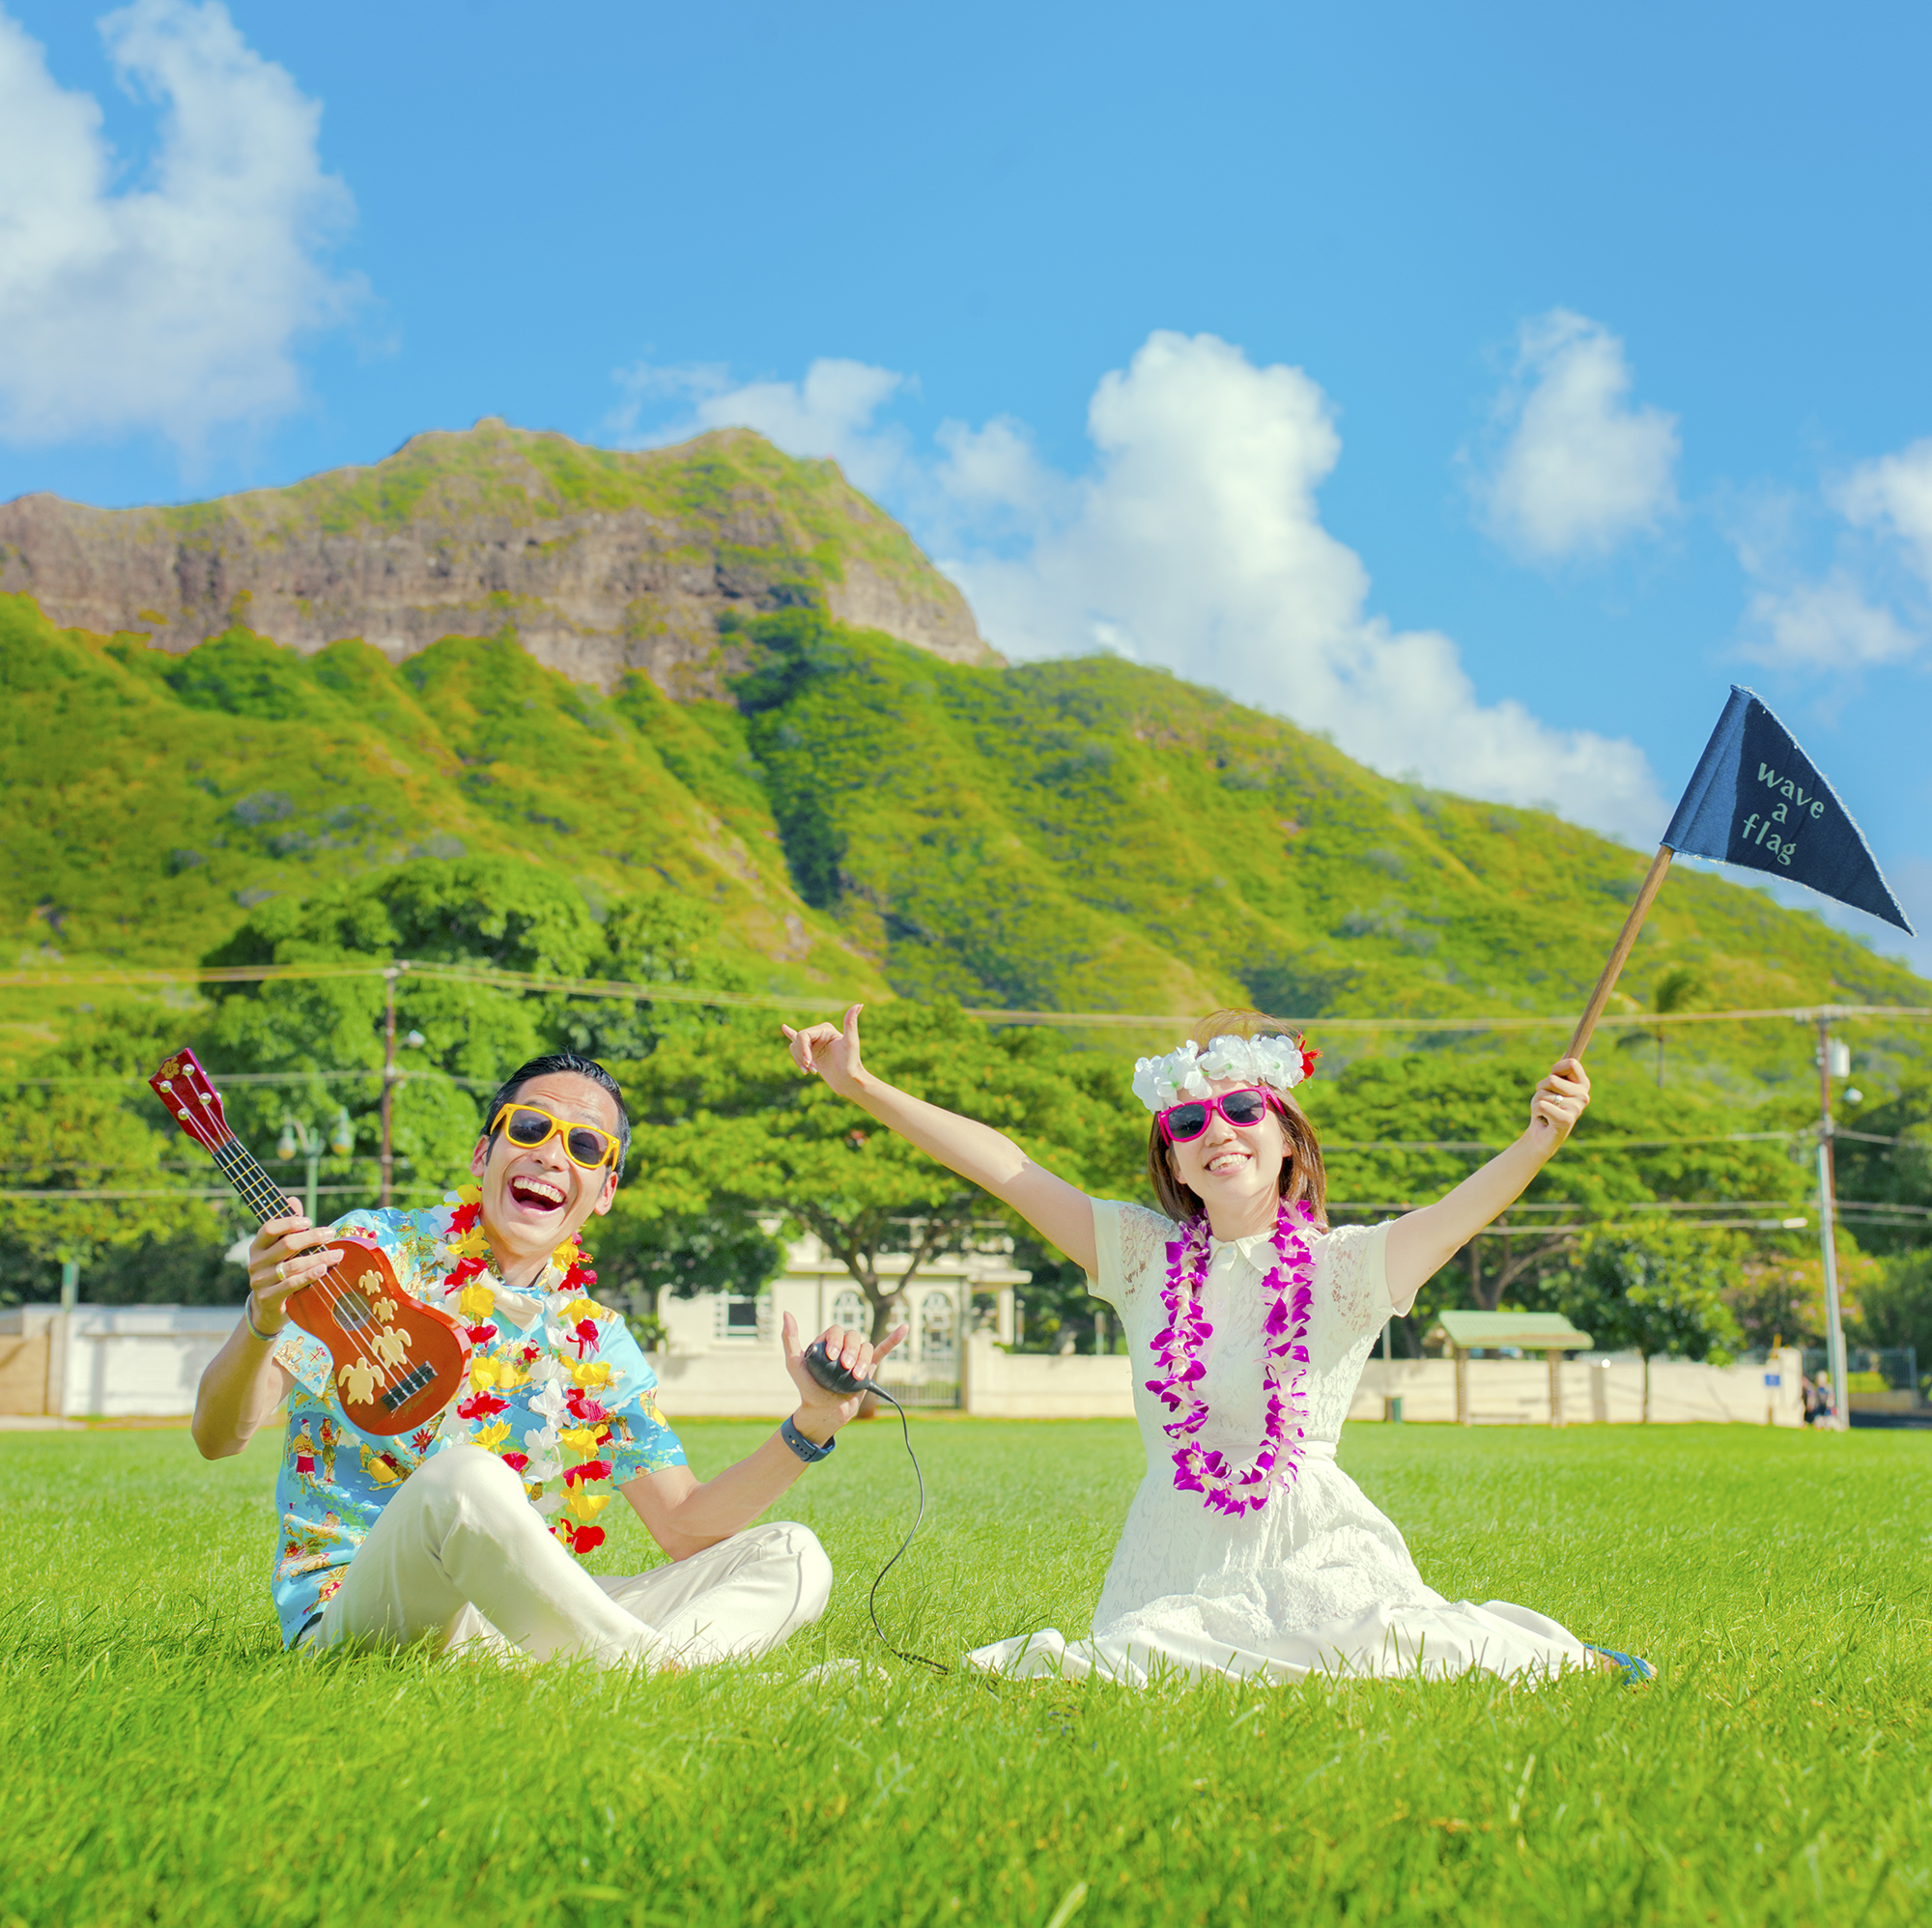 Hawaii, United States / 하와이, 미국 / ハワイ, アメリカ合衆国